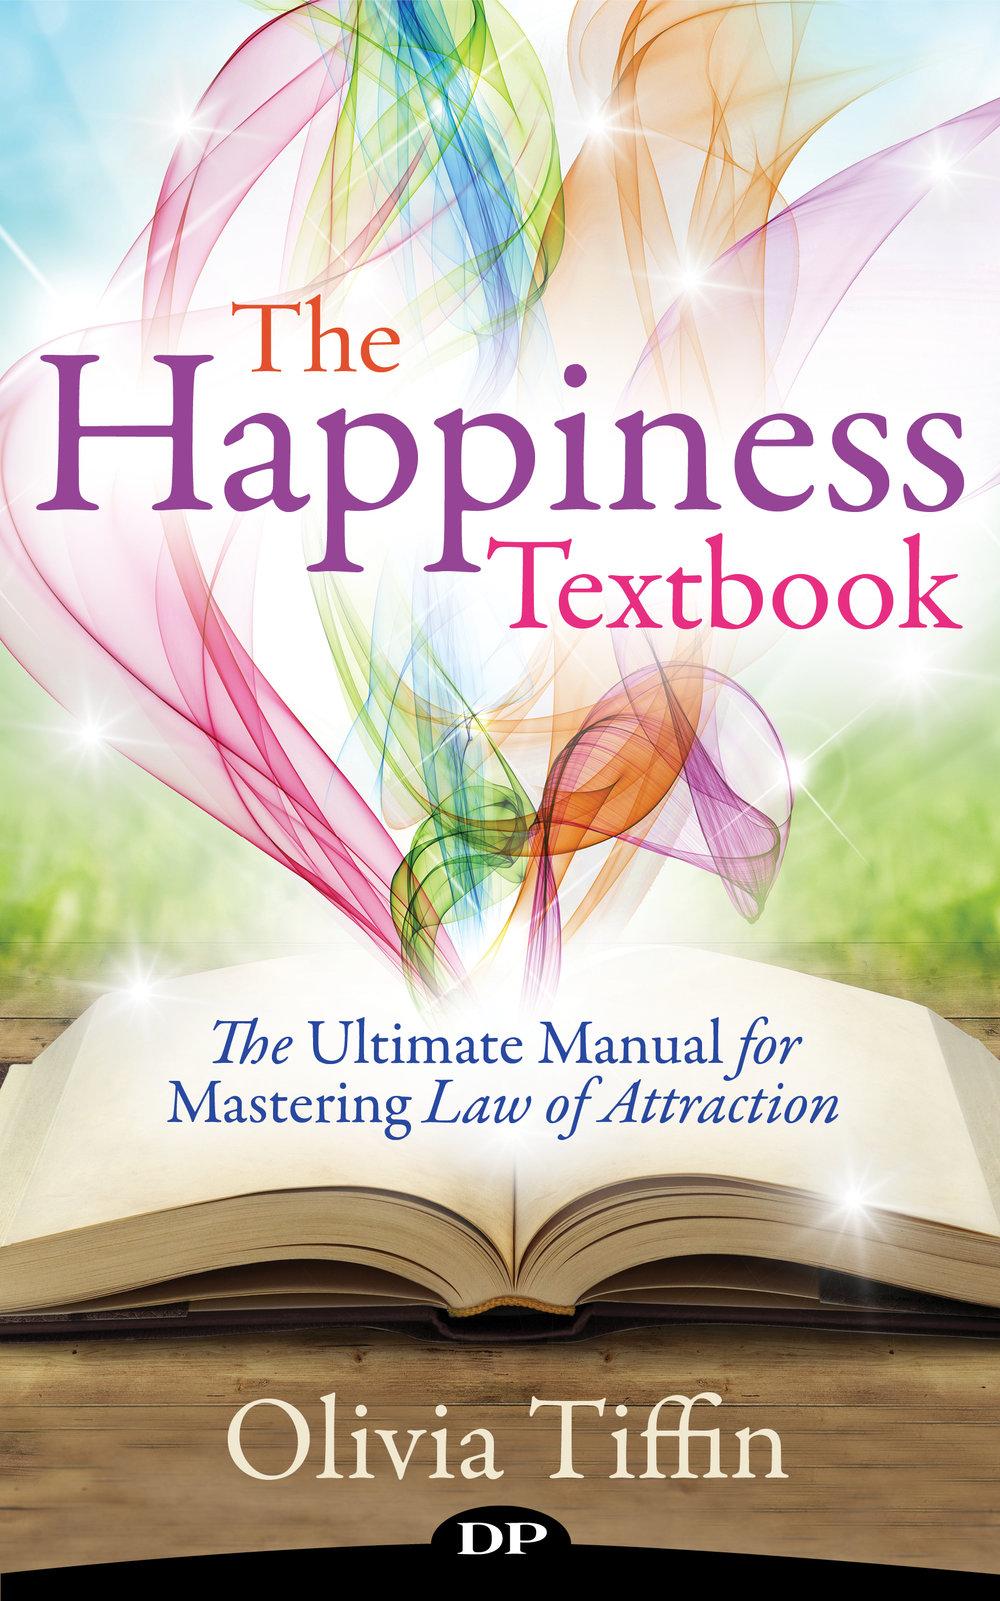 Tiffin_The Happiness Textbook_EBK_Final.jpg